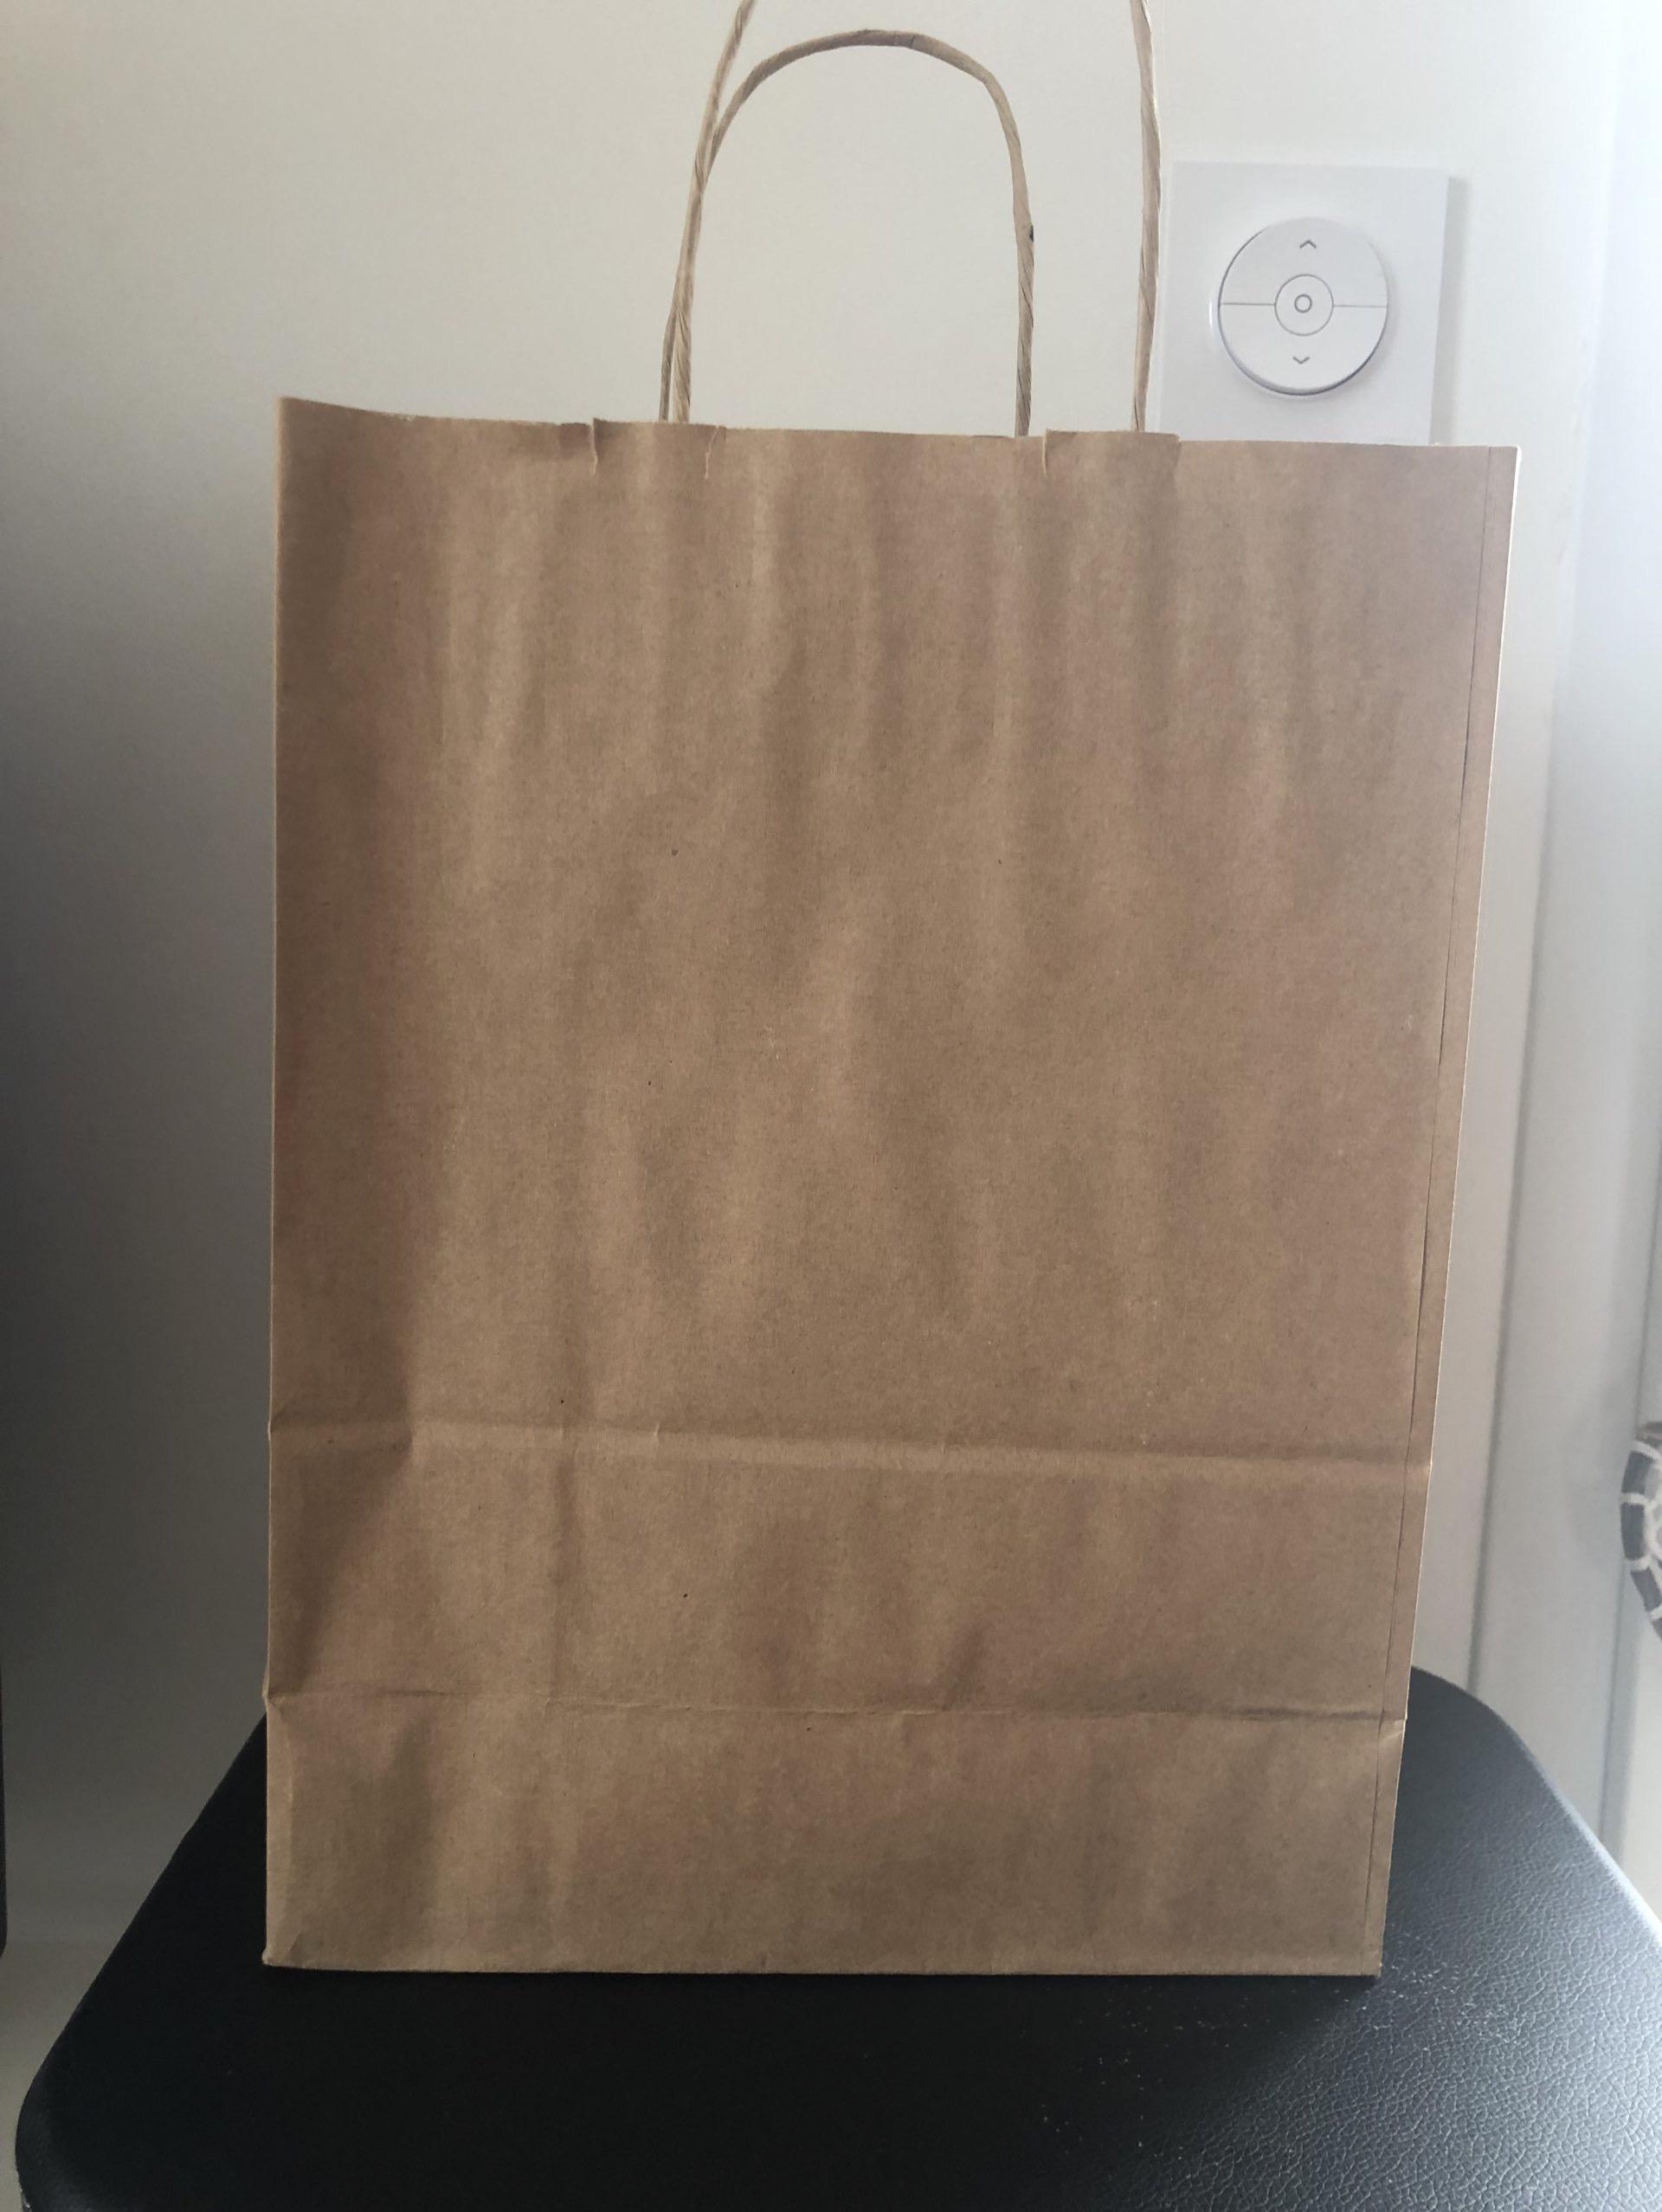 J'ai testé pour vous le sac kraft 24x12x32cm a l'unité